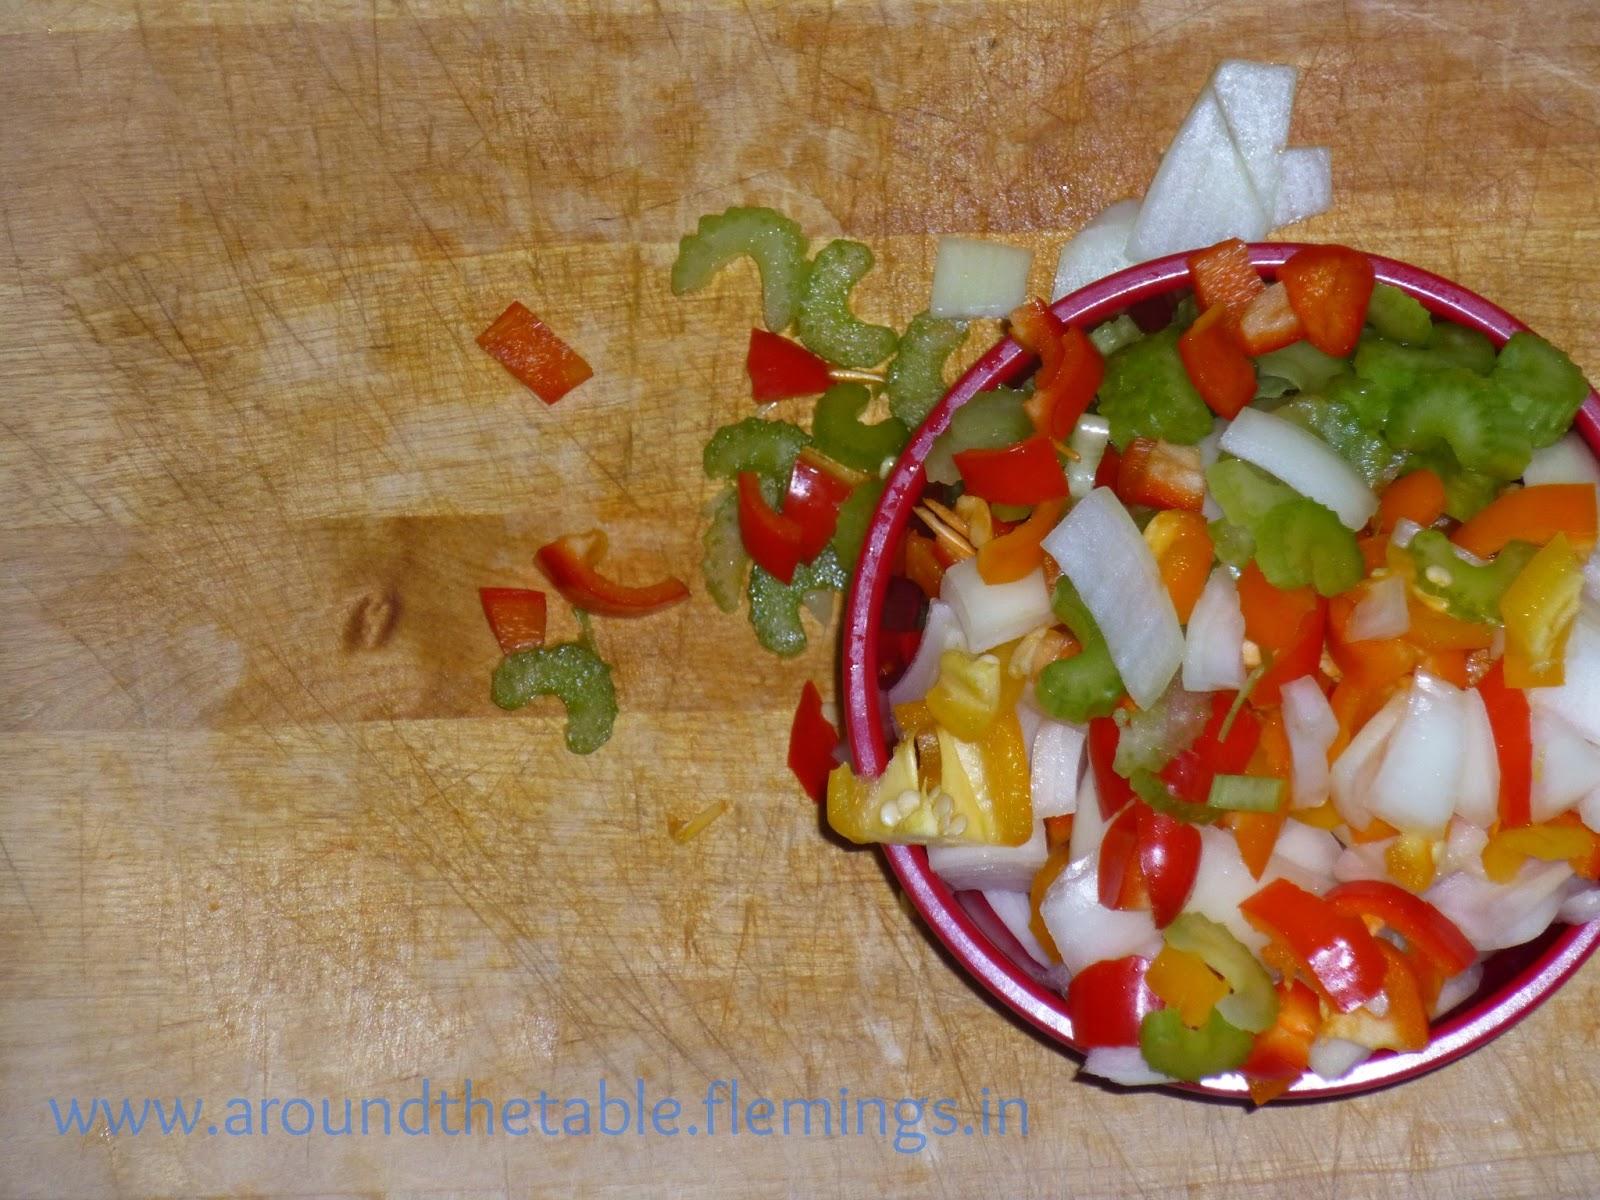 http://3.bp.blogspot.com/-RIIOjBBQecE/UTZ6Wavs8SI/AAAAAAAACM8/Qzl2iSEQ7Vg/s1600/chopped-veggies.jpg.jpg